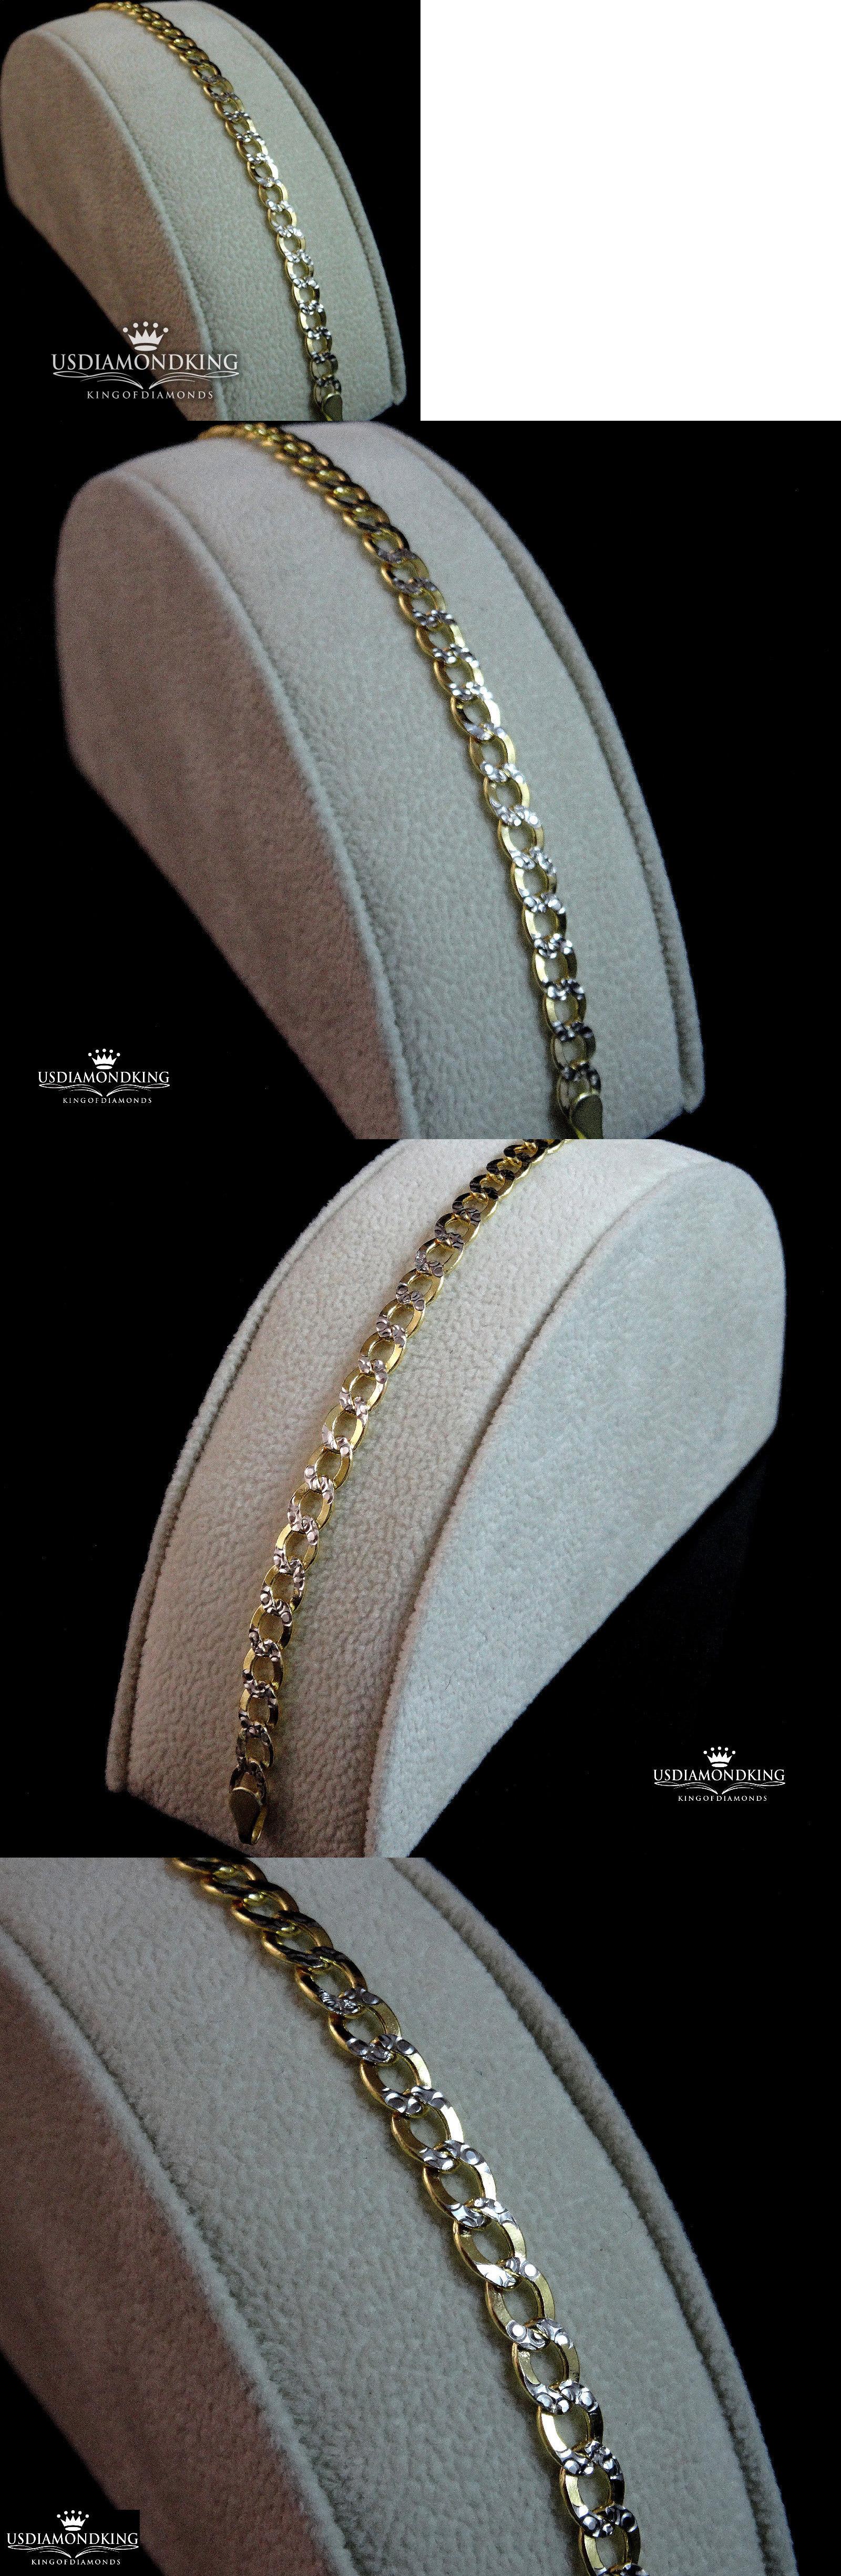 Bracelets unisex k marked solid yellow gold tone cuban